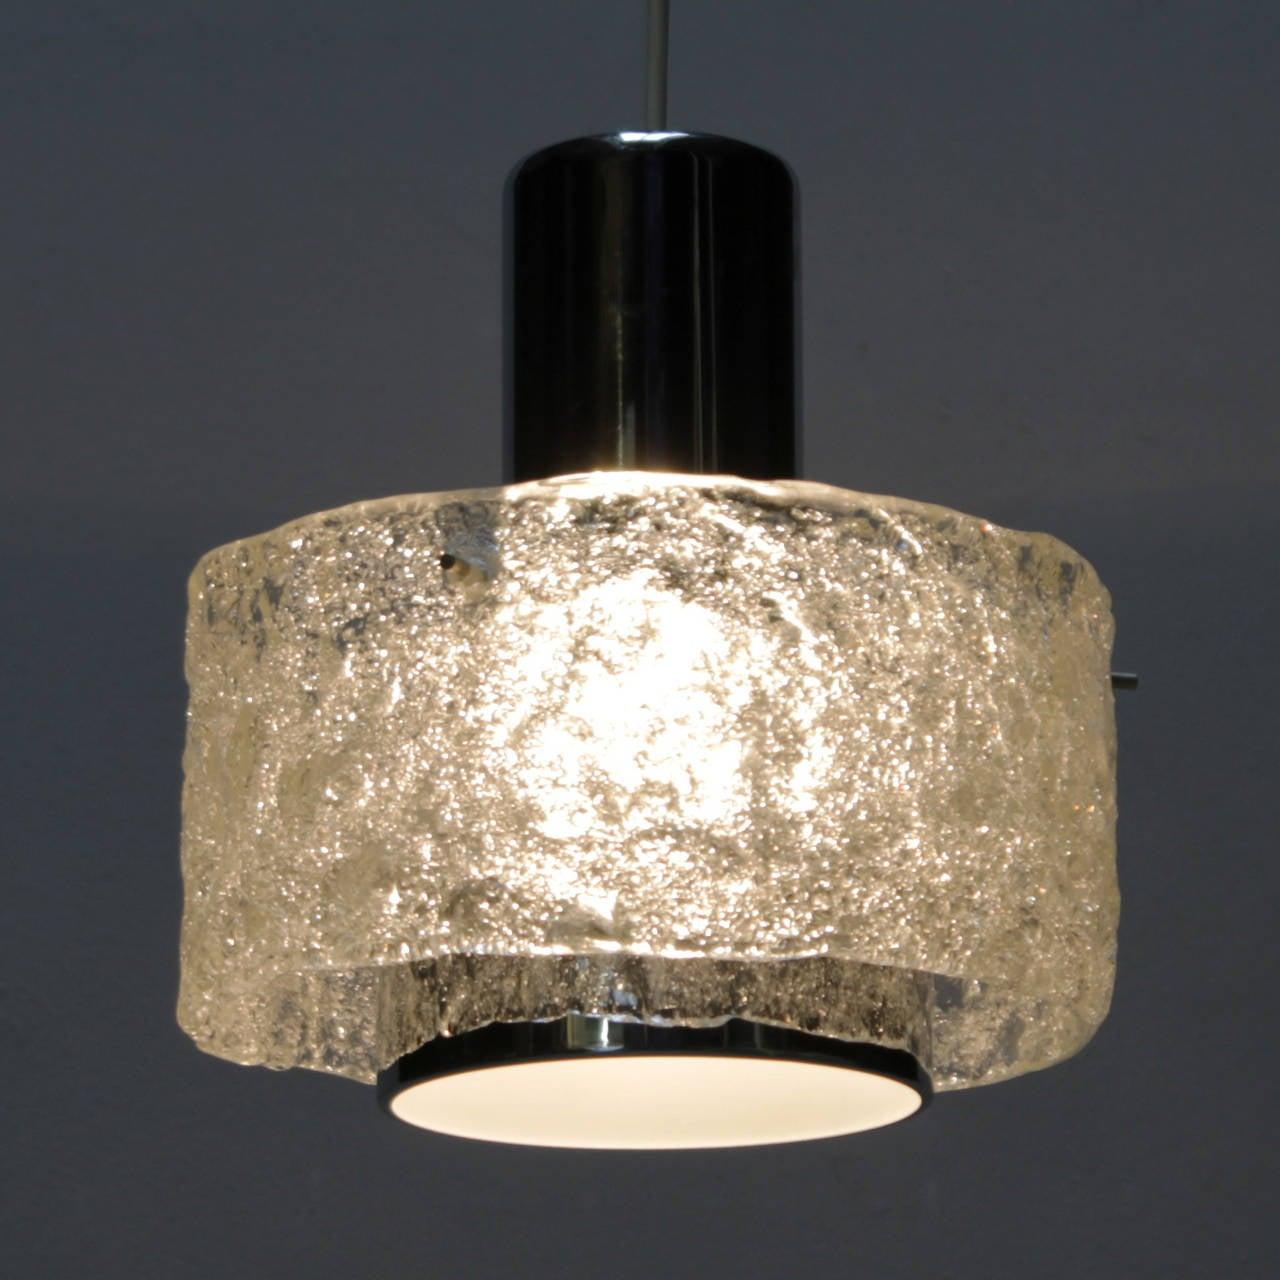 German Pendant in the style of Kalmar Lighting For Sale